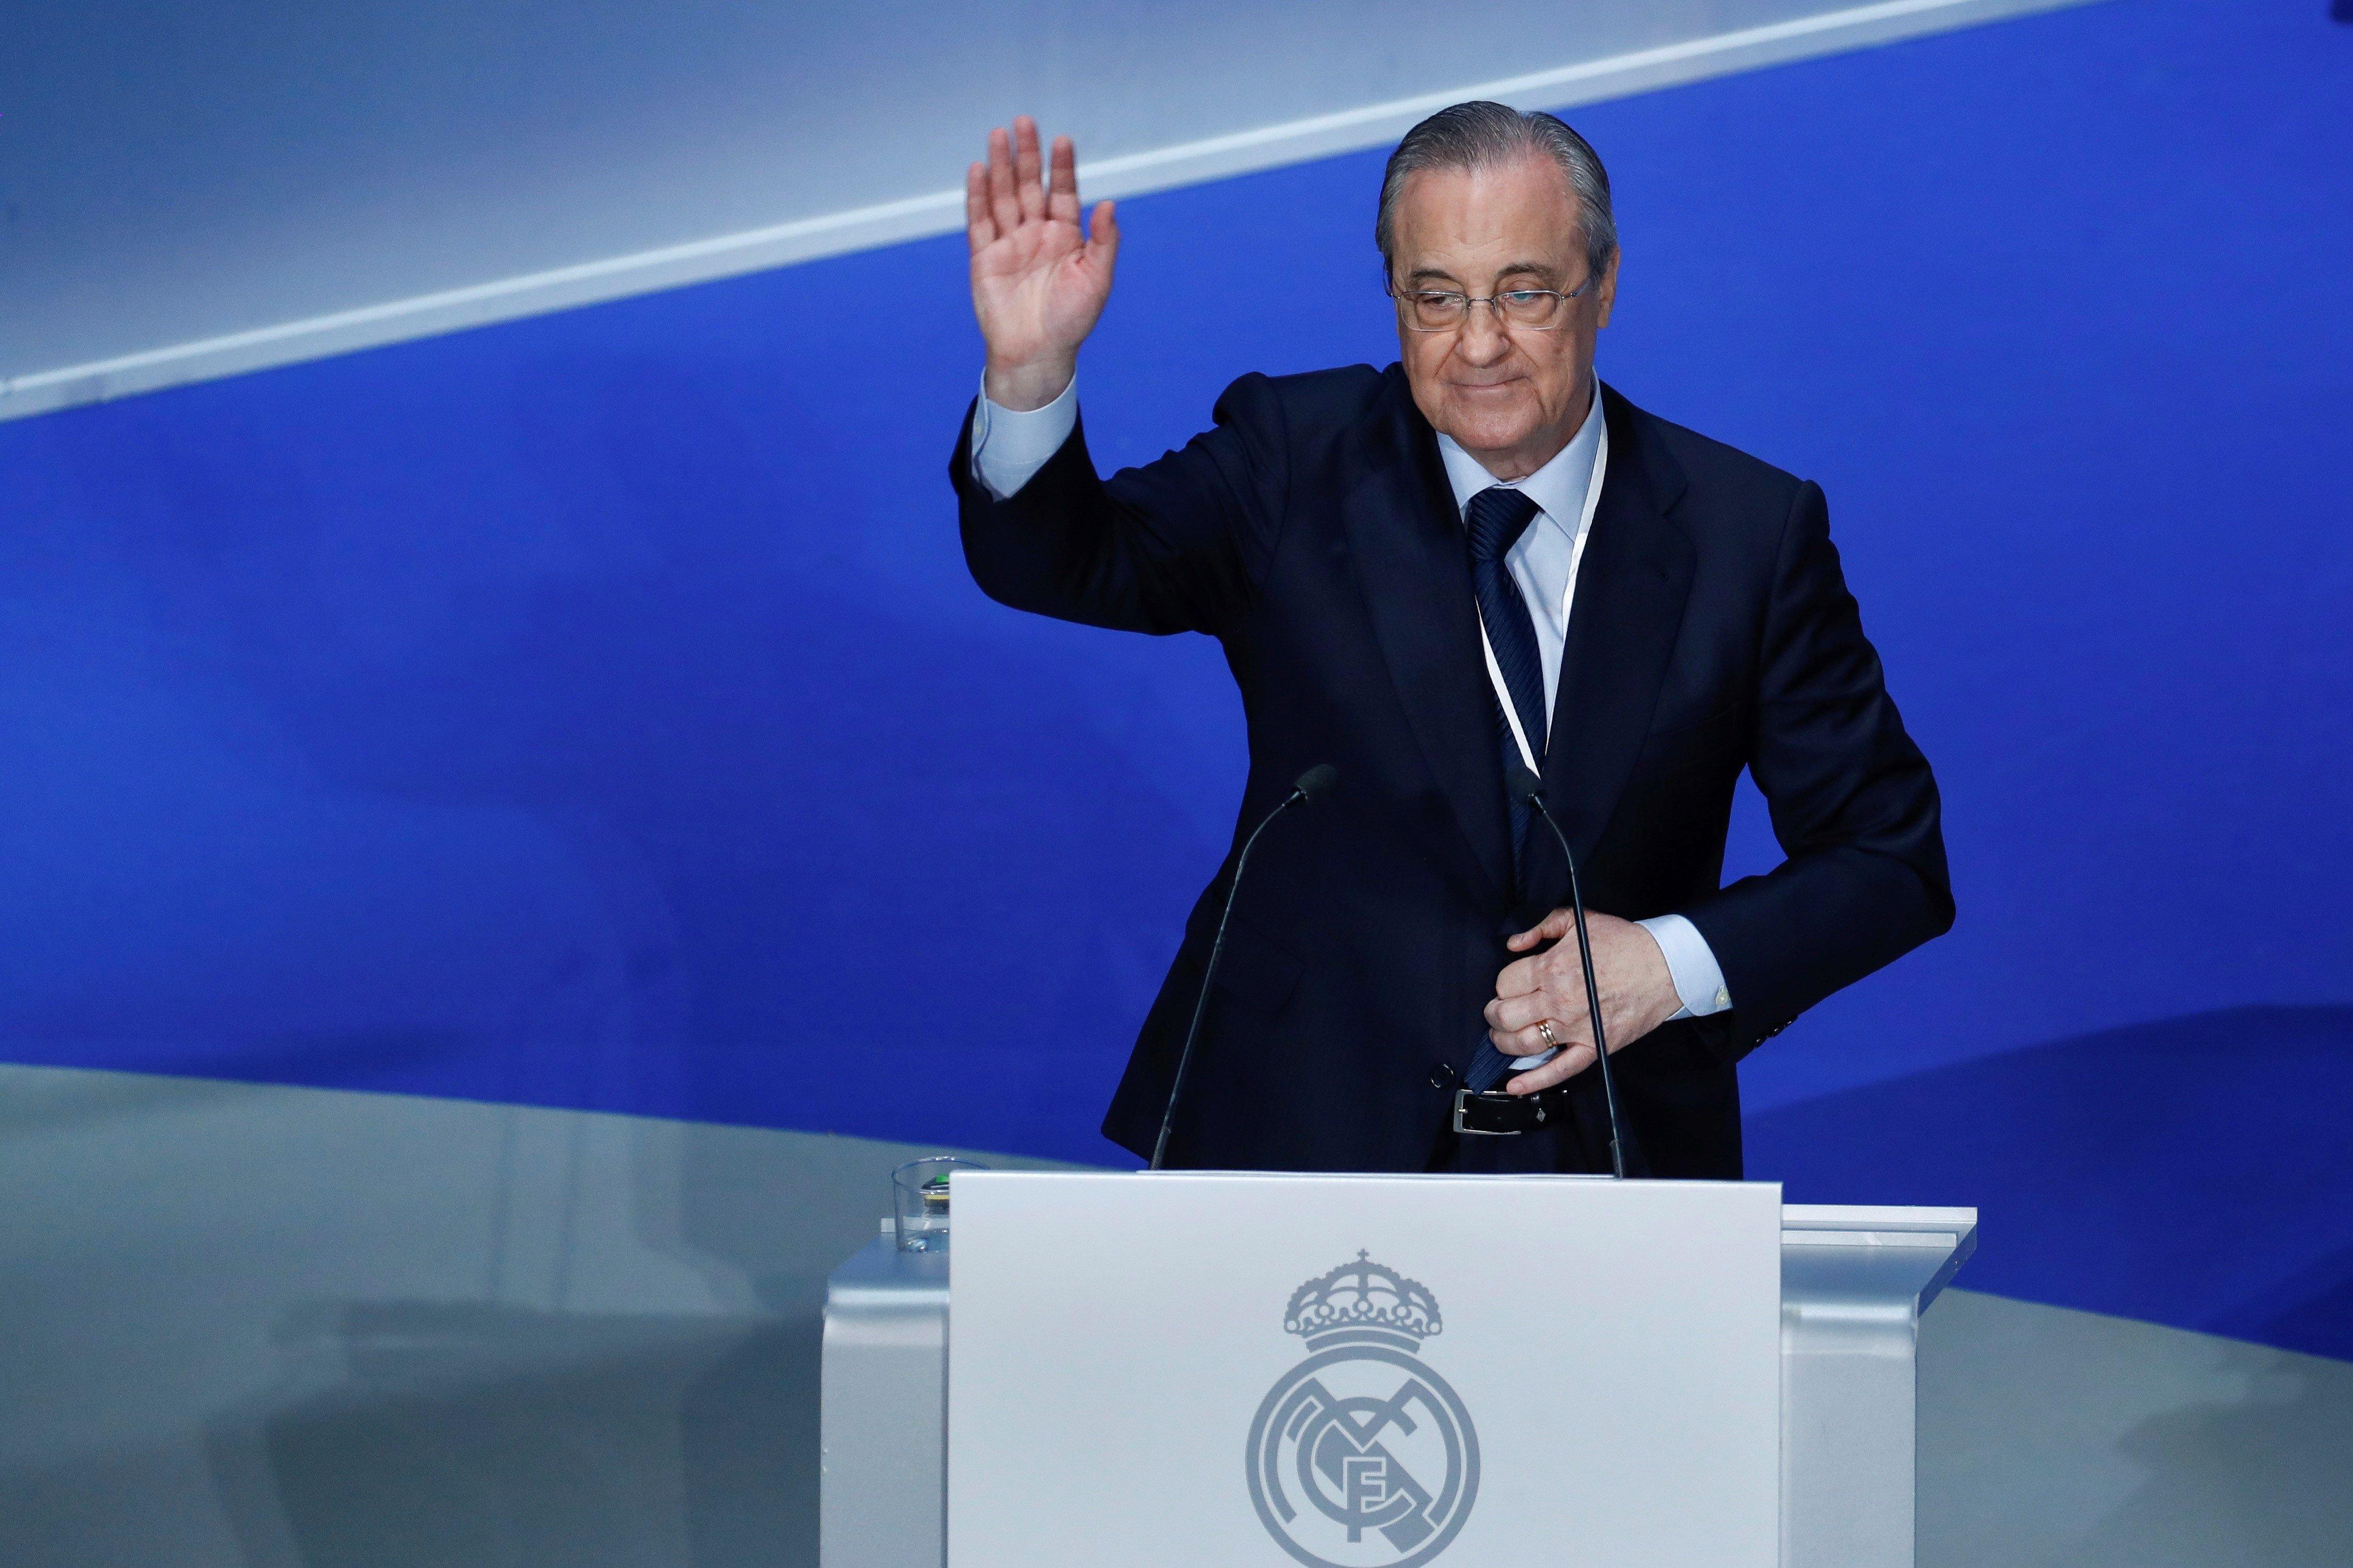 Florentino Pérez Assemblea Madrid socis   EFE